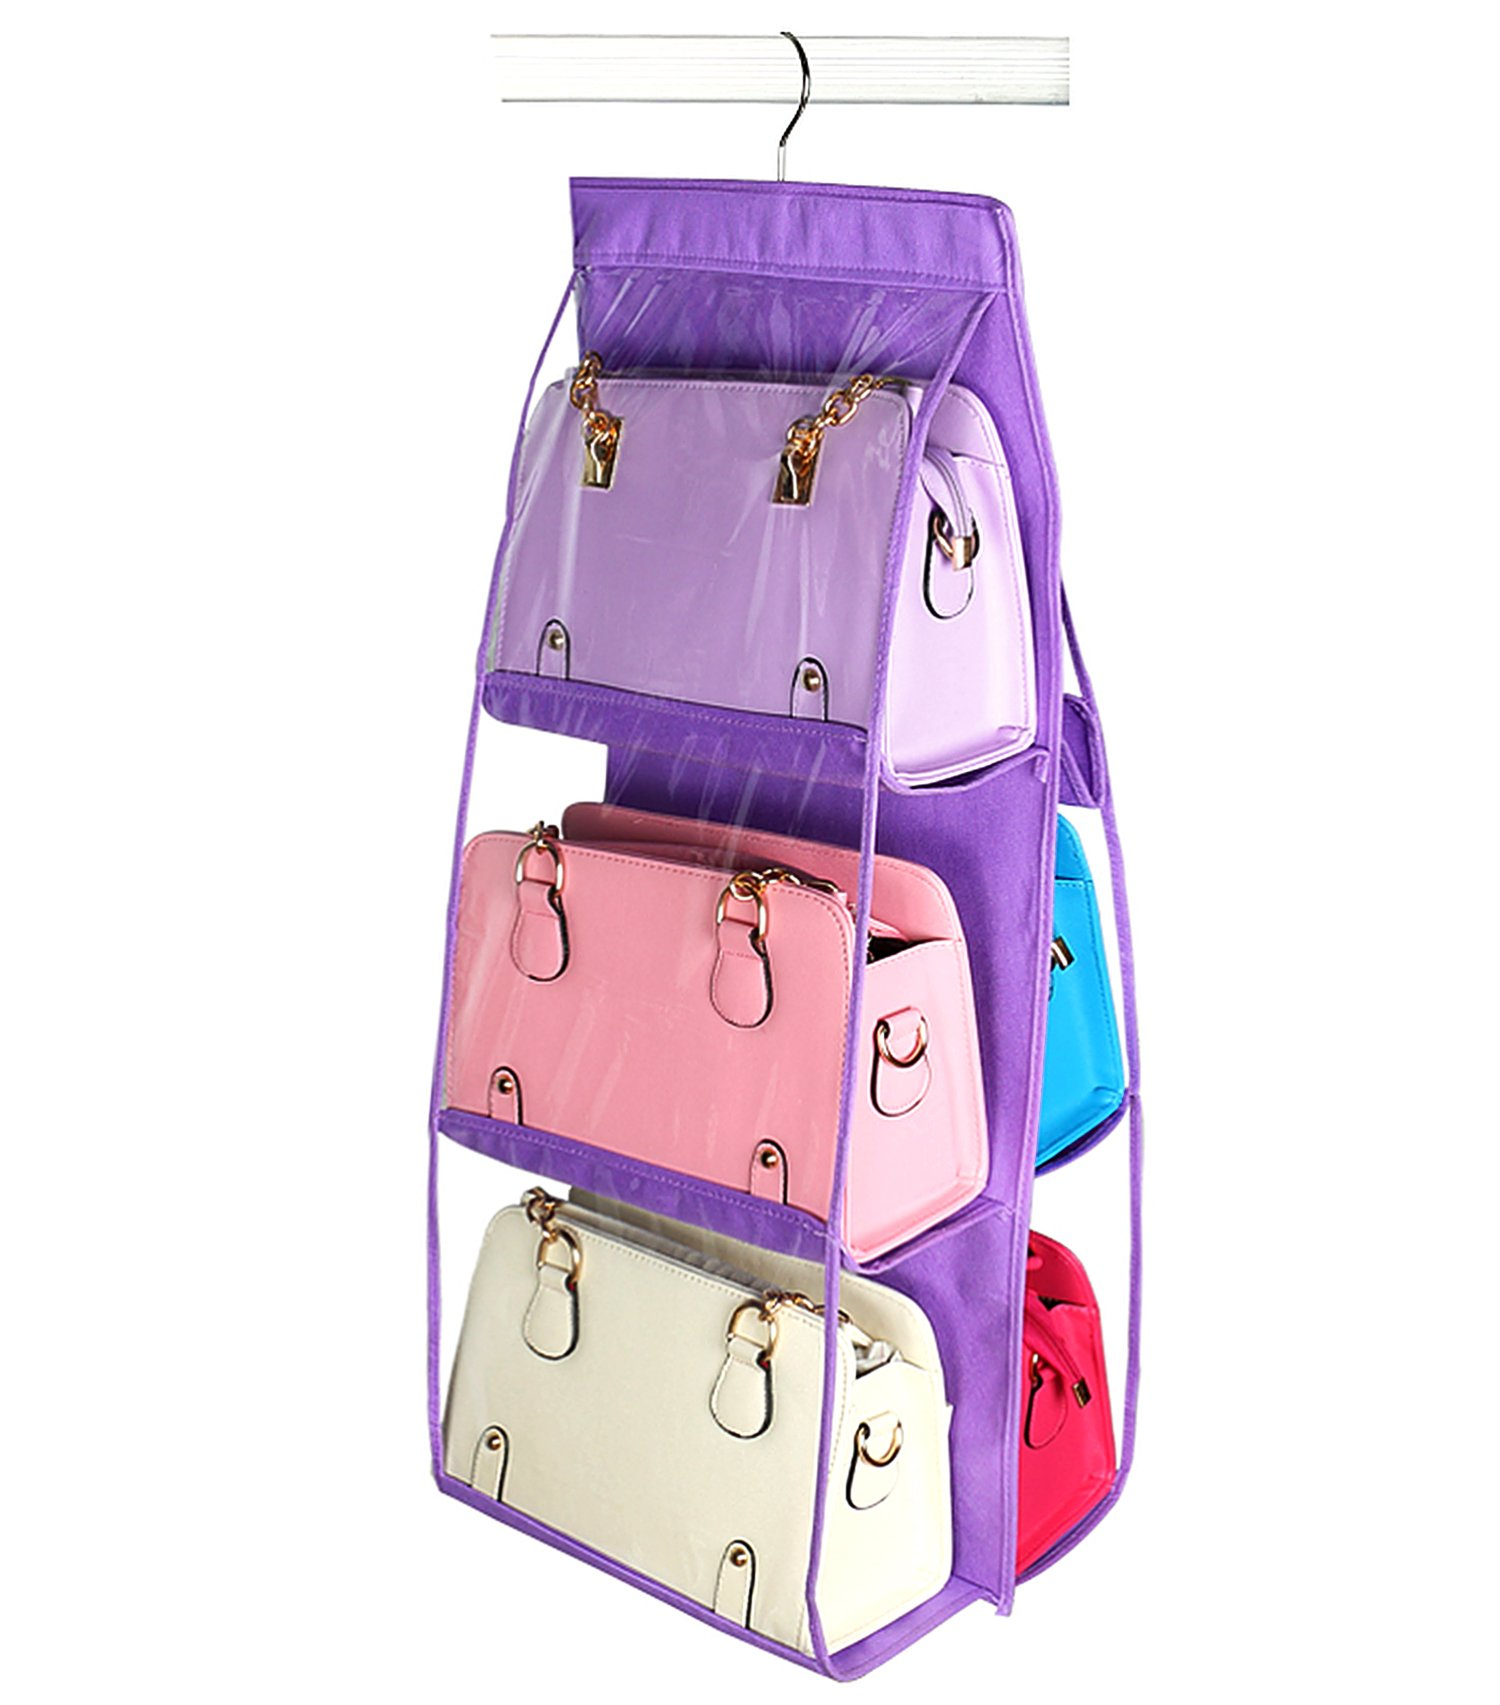 Vercord 6-Pocket Hanging Purse Handbag Tote Storage Holder Organizer Dust-proof Closet Wardrobe Hatstand Space Saver, Purple